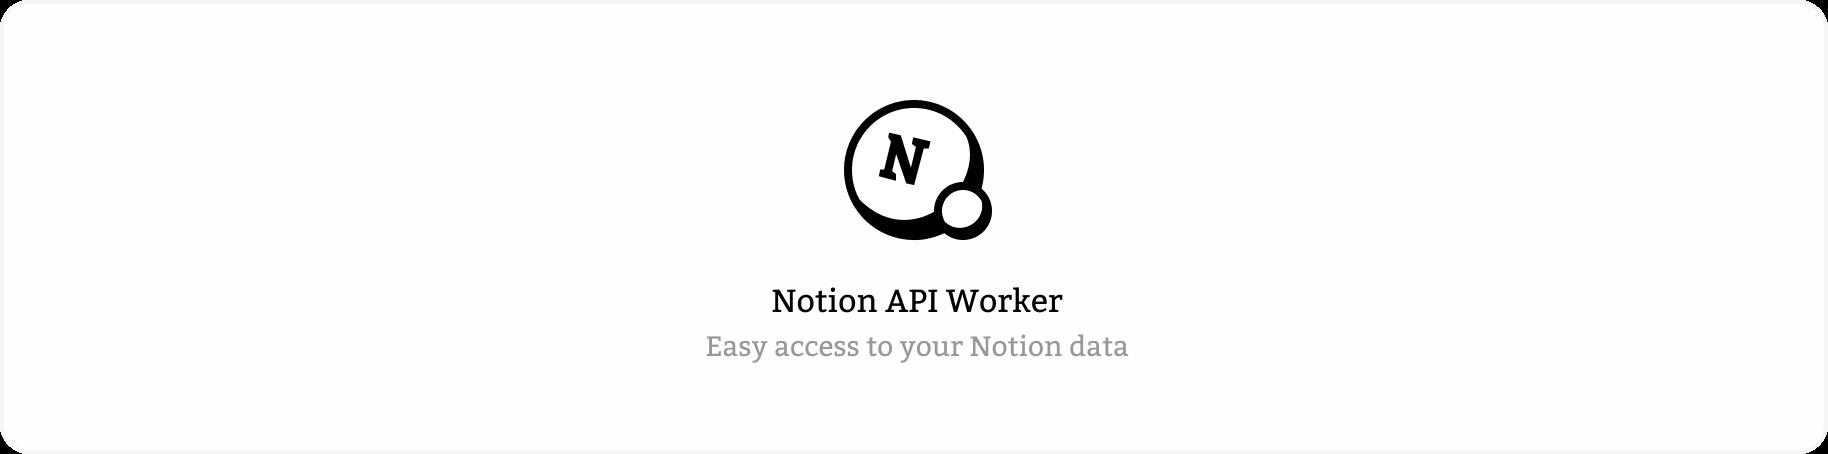 Notion API Worker